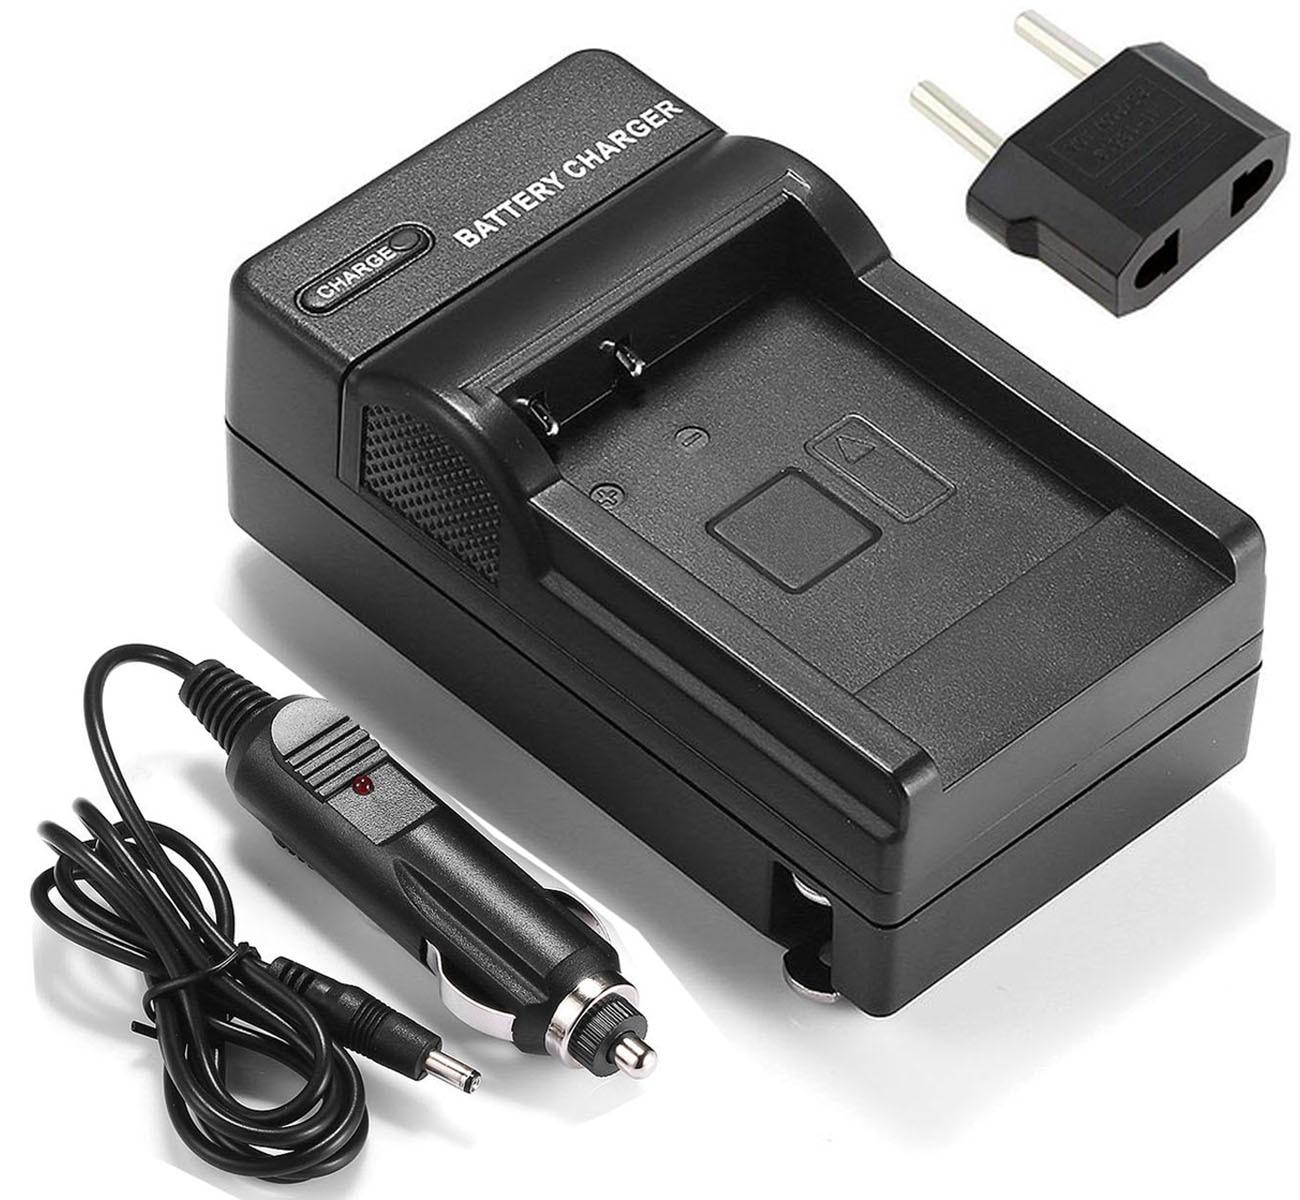 Battery Charger for Samsung ES50, ES55, ES60, EX1, EX2F, HZ10W, HZ15W, HZ25W, HZ30W, HZ35W, HZ50W Digital Camera